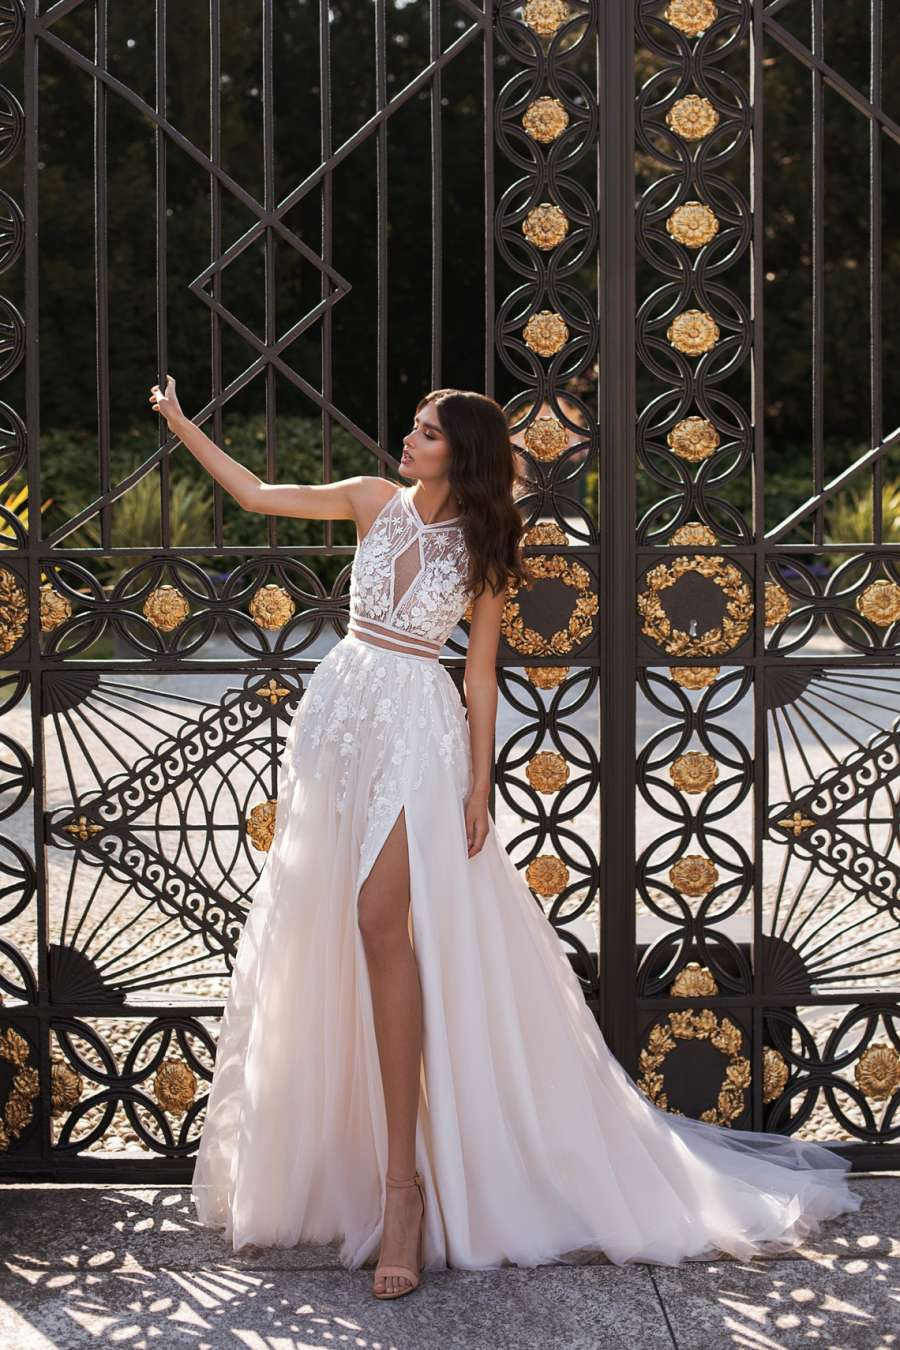 свадебное платье Abramina_(1).900x900w